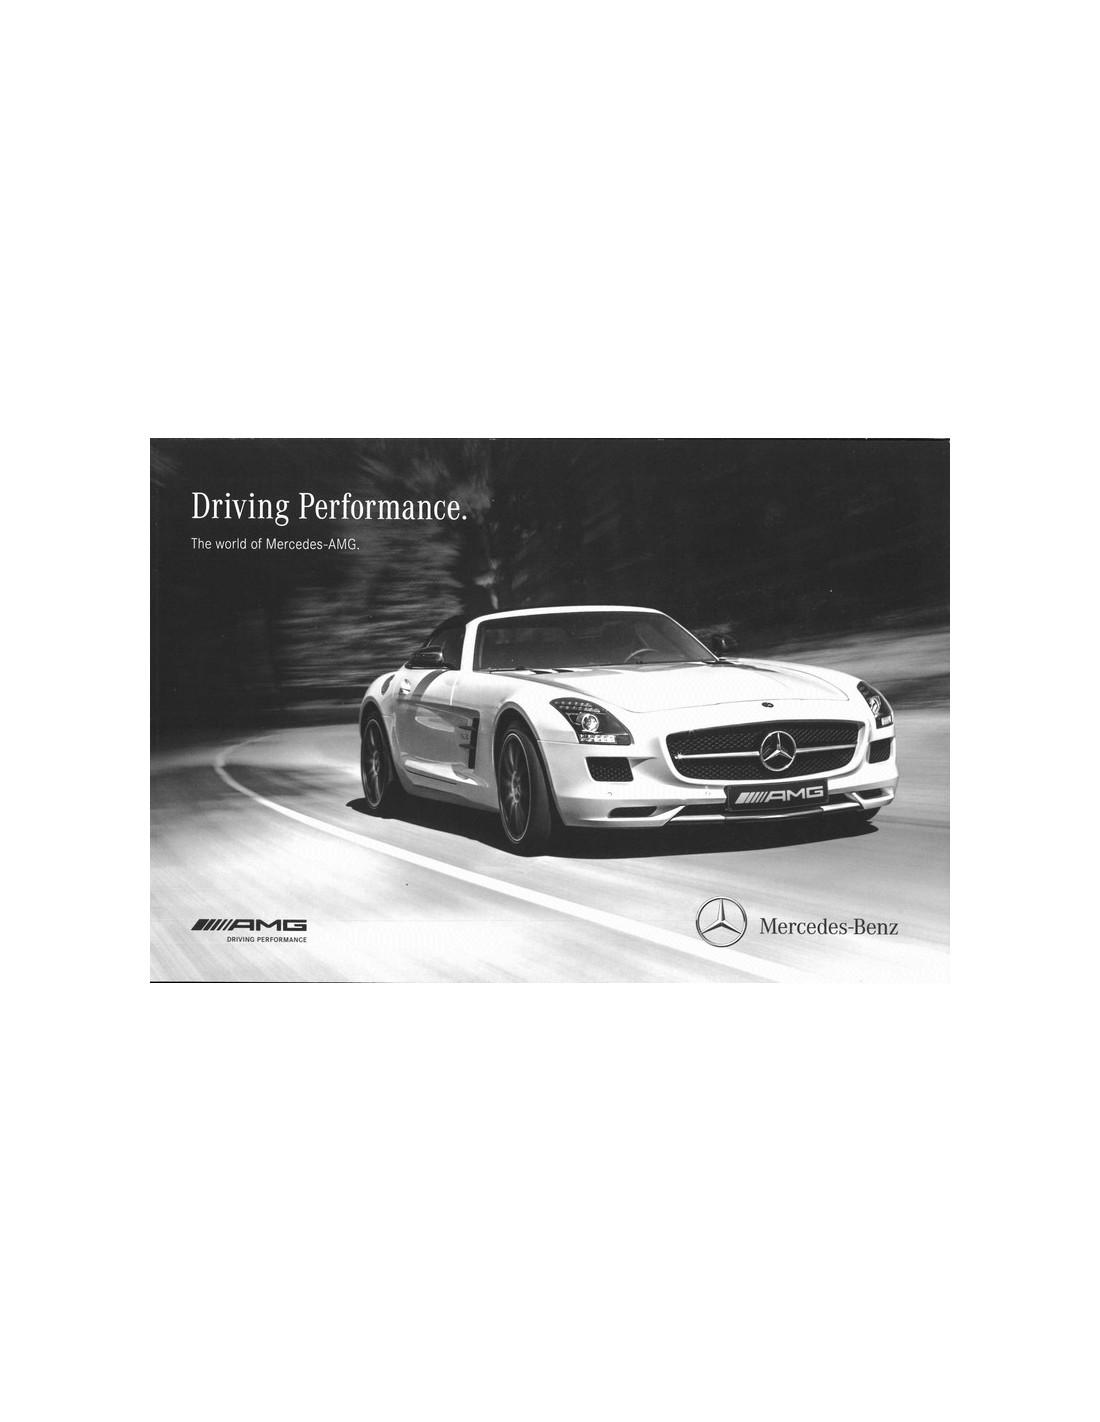 2013 mercedes benz amg brochure engels usa for Mercedes benz amg usa